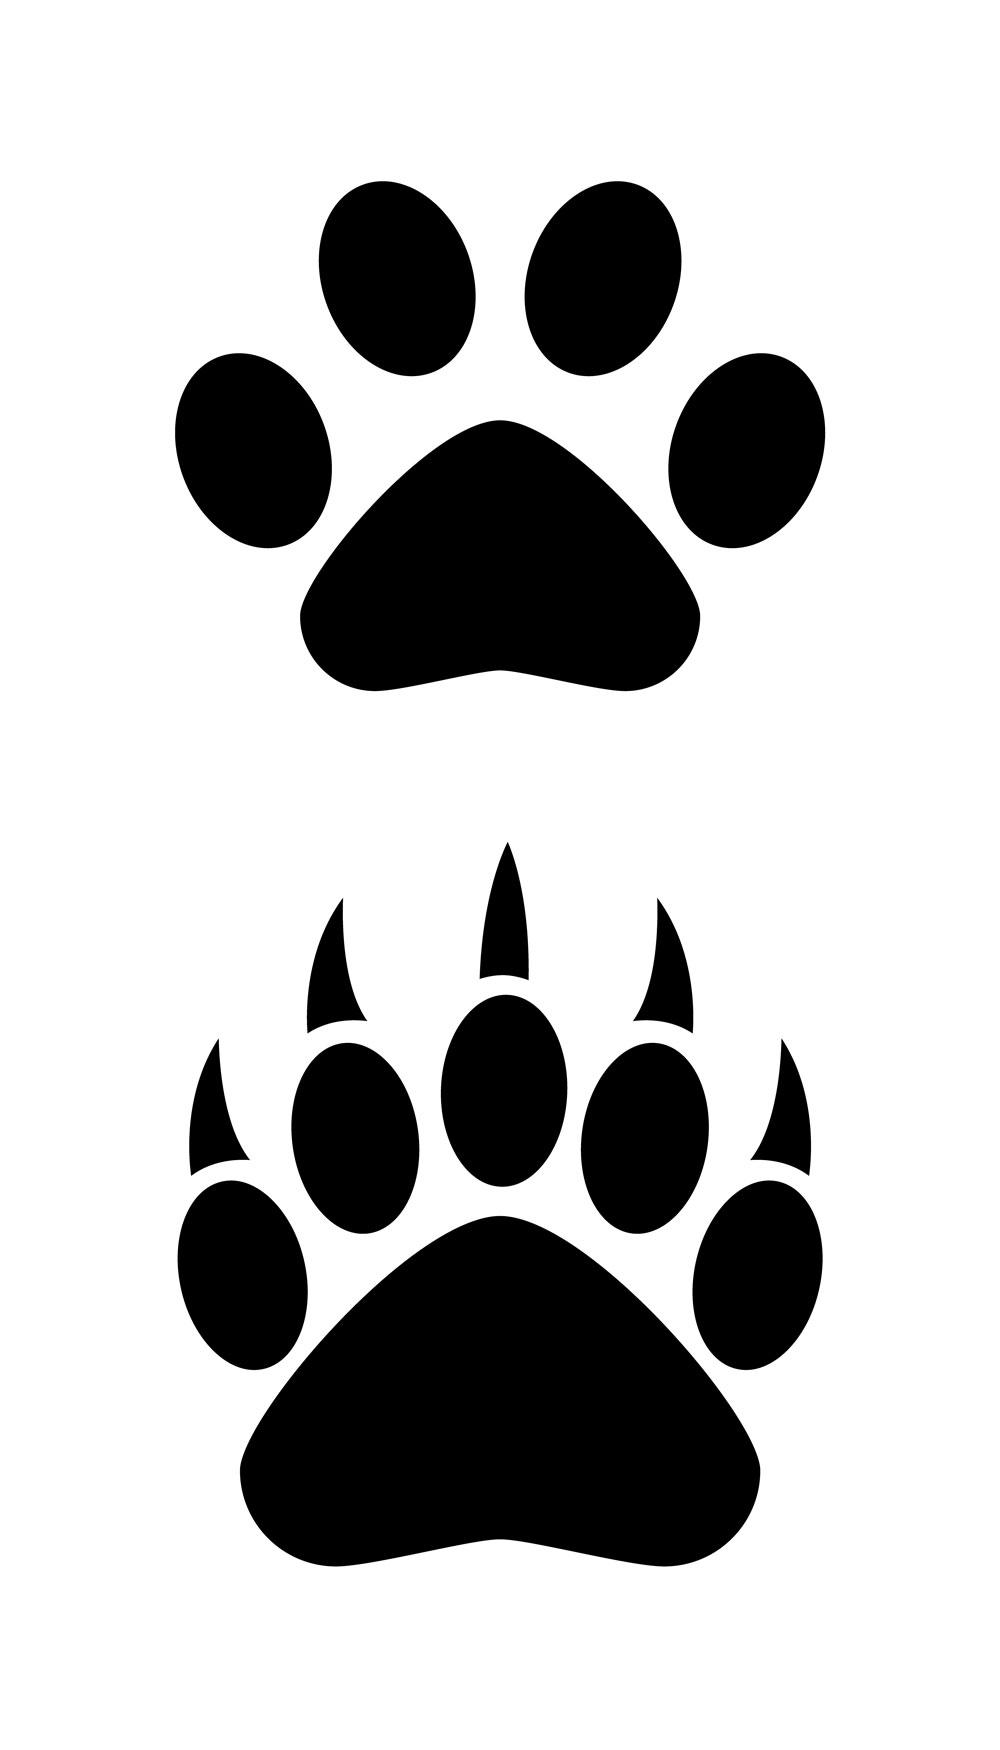 Polar Bear Paw Print Clip Art - ClipArt Best (1000 x 1750 Pixel)